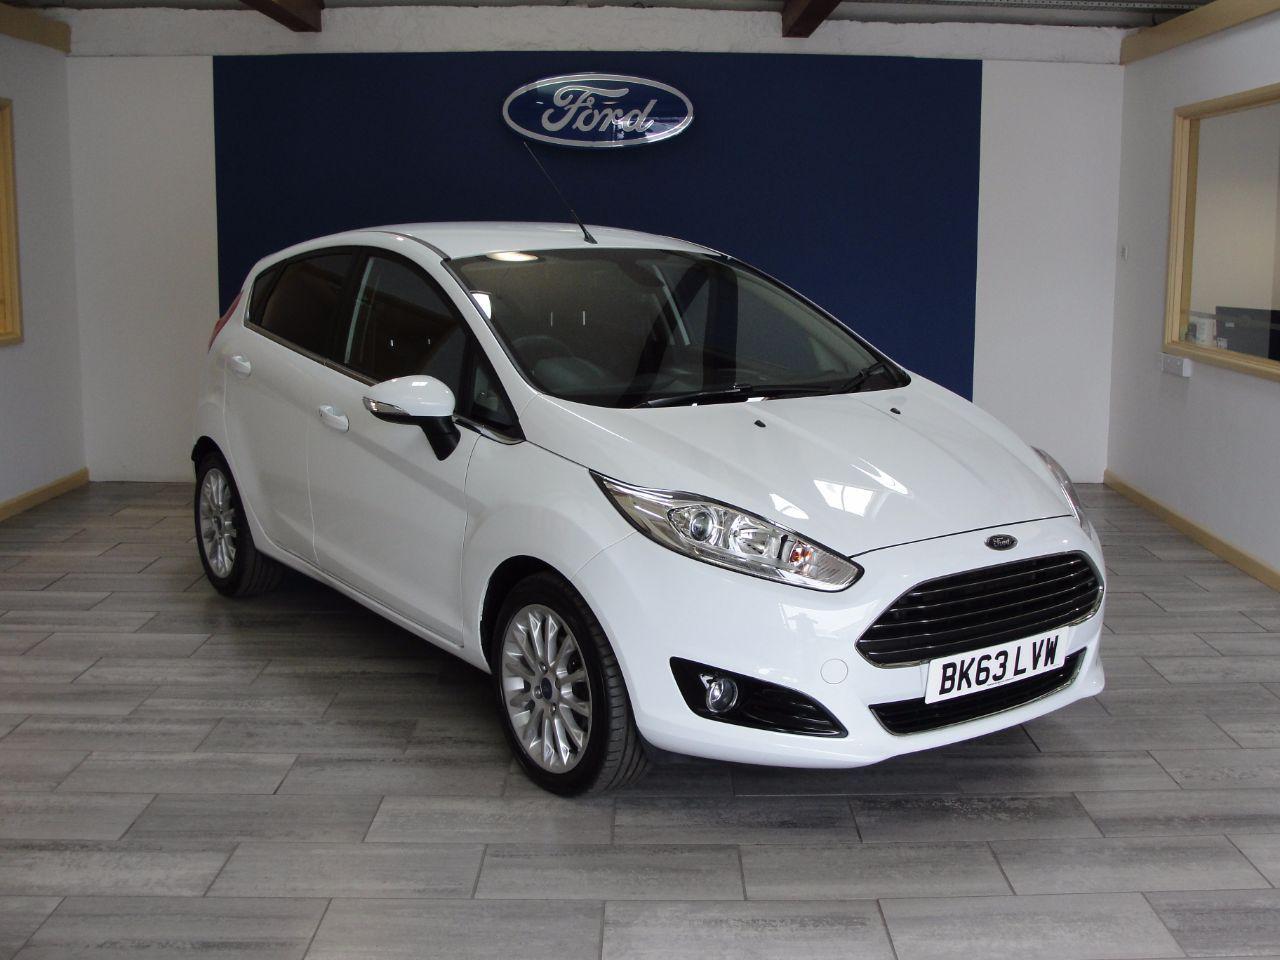 10+ Ford focus 16 petrol inspirations